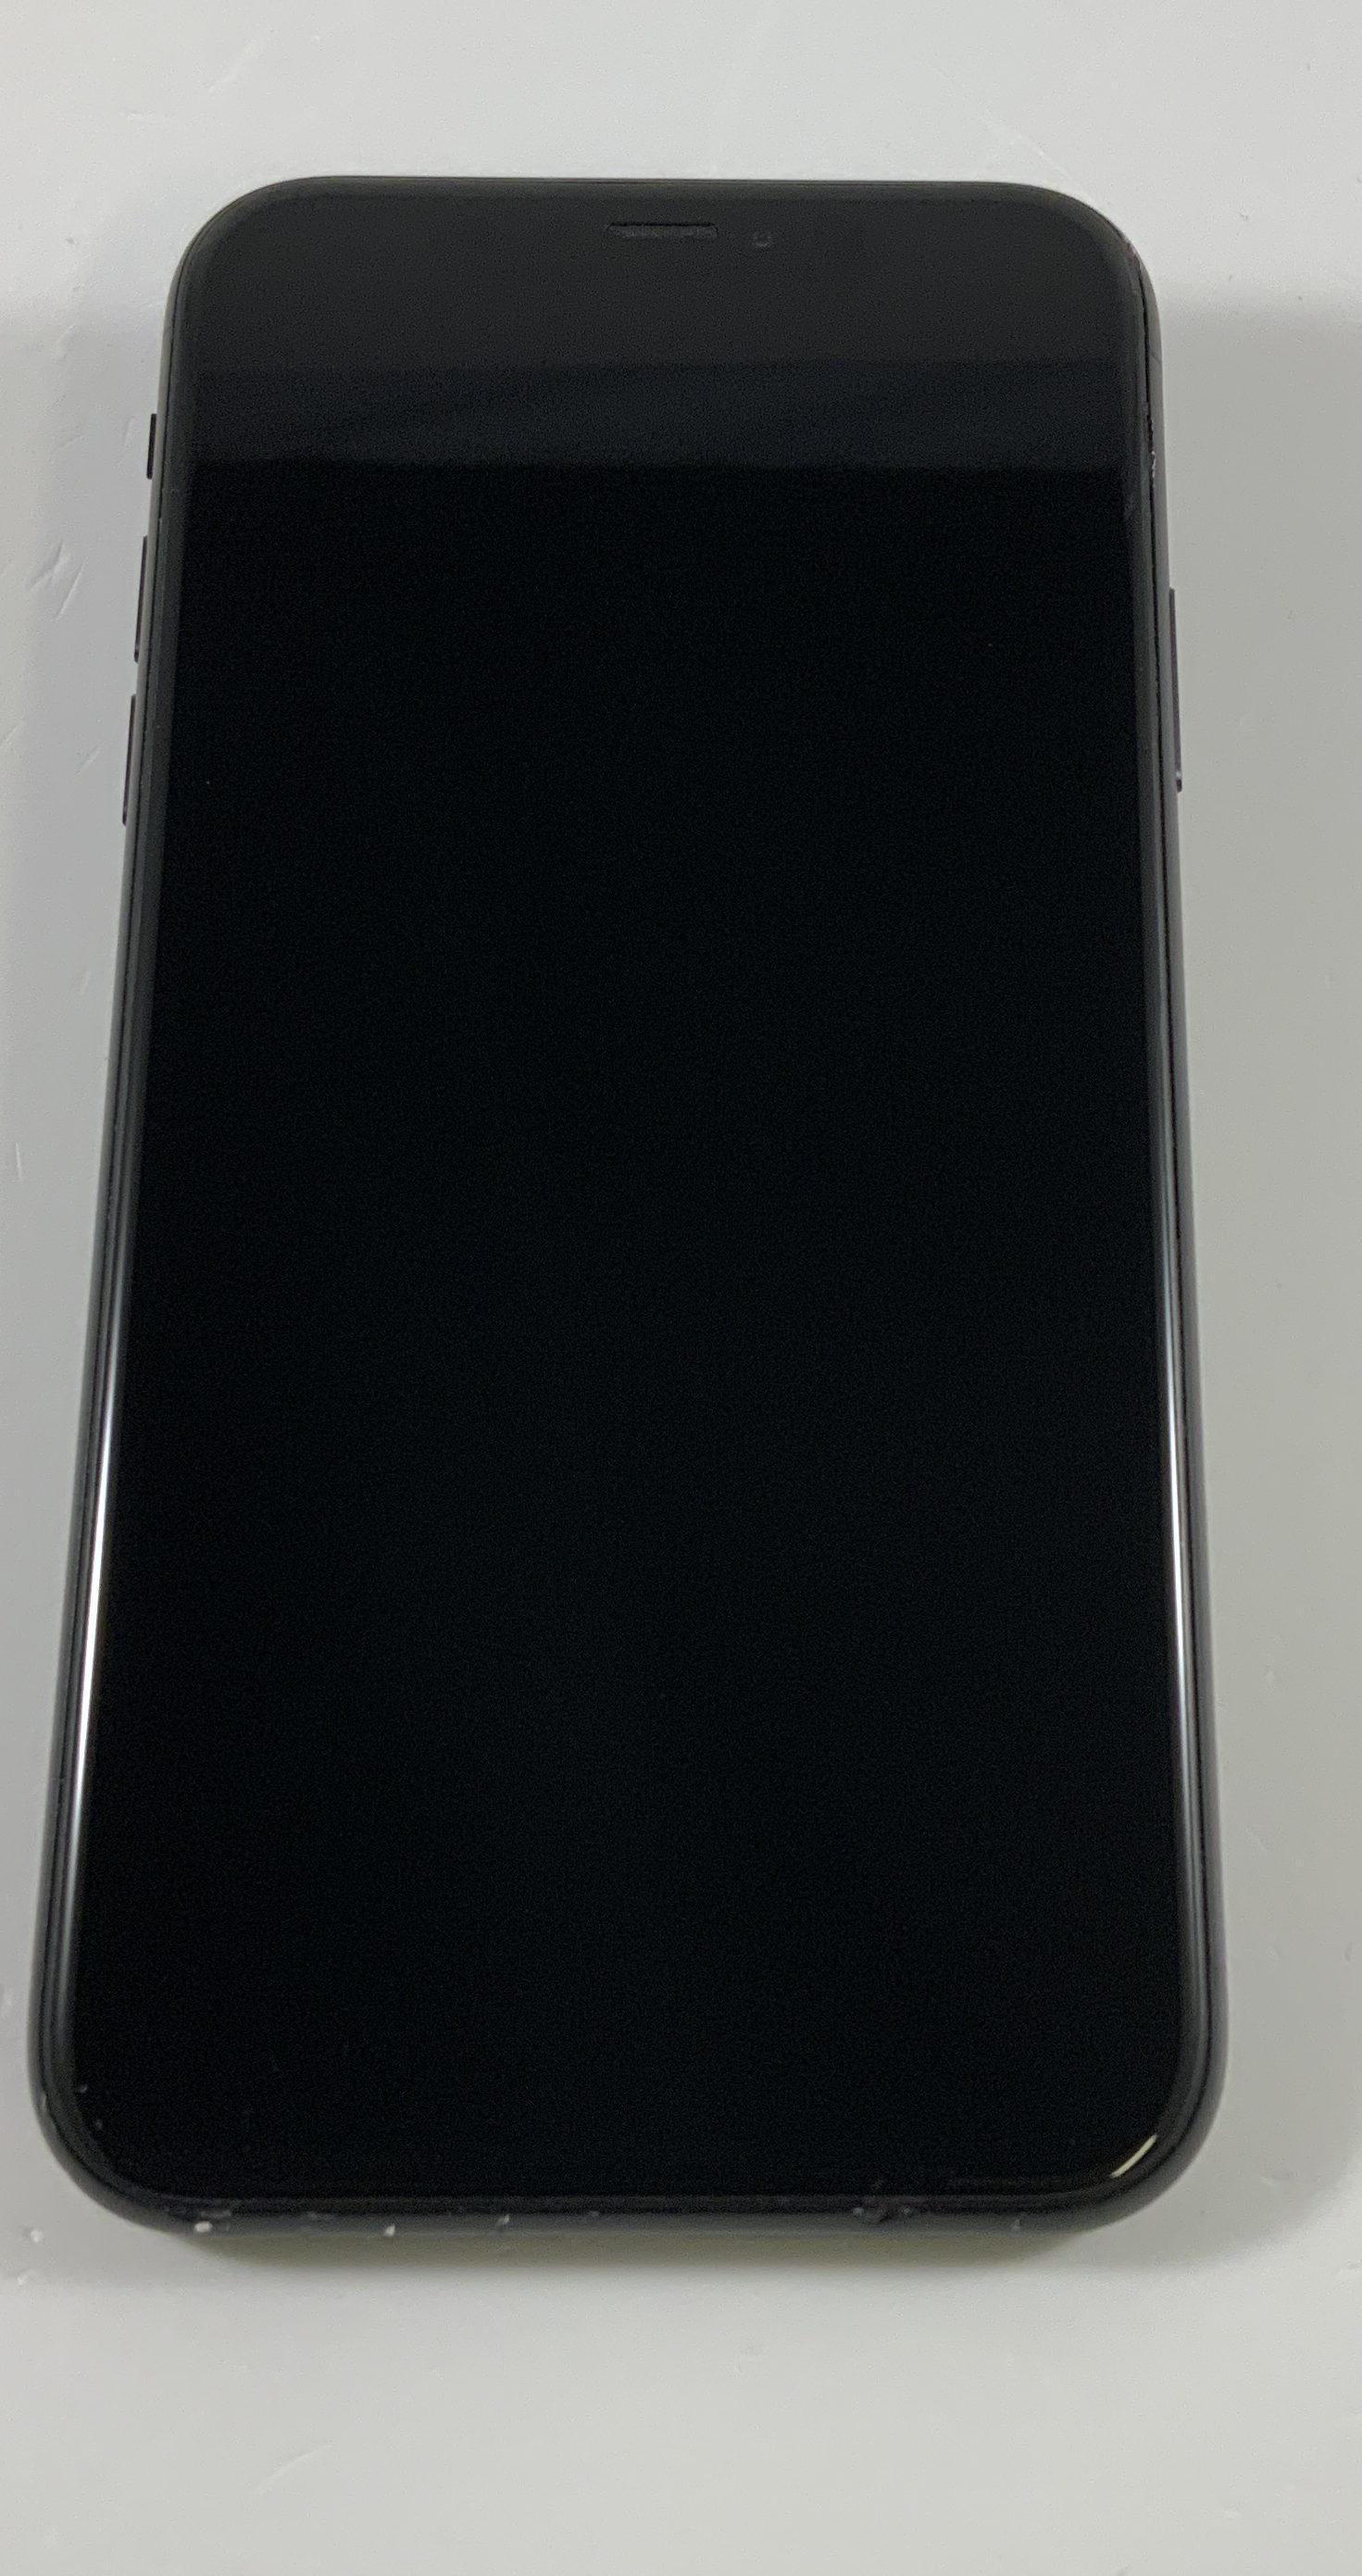 iPhone XR 128GB, 128GB, Black, imagen 1